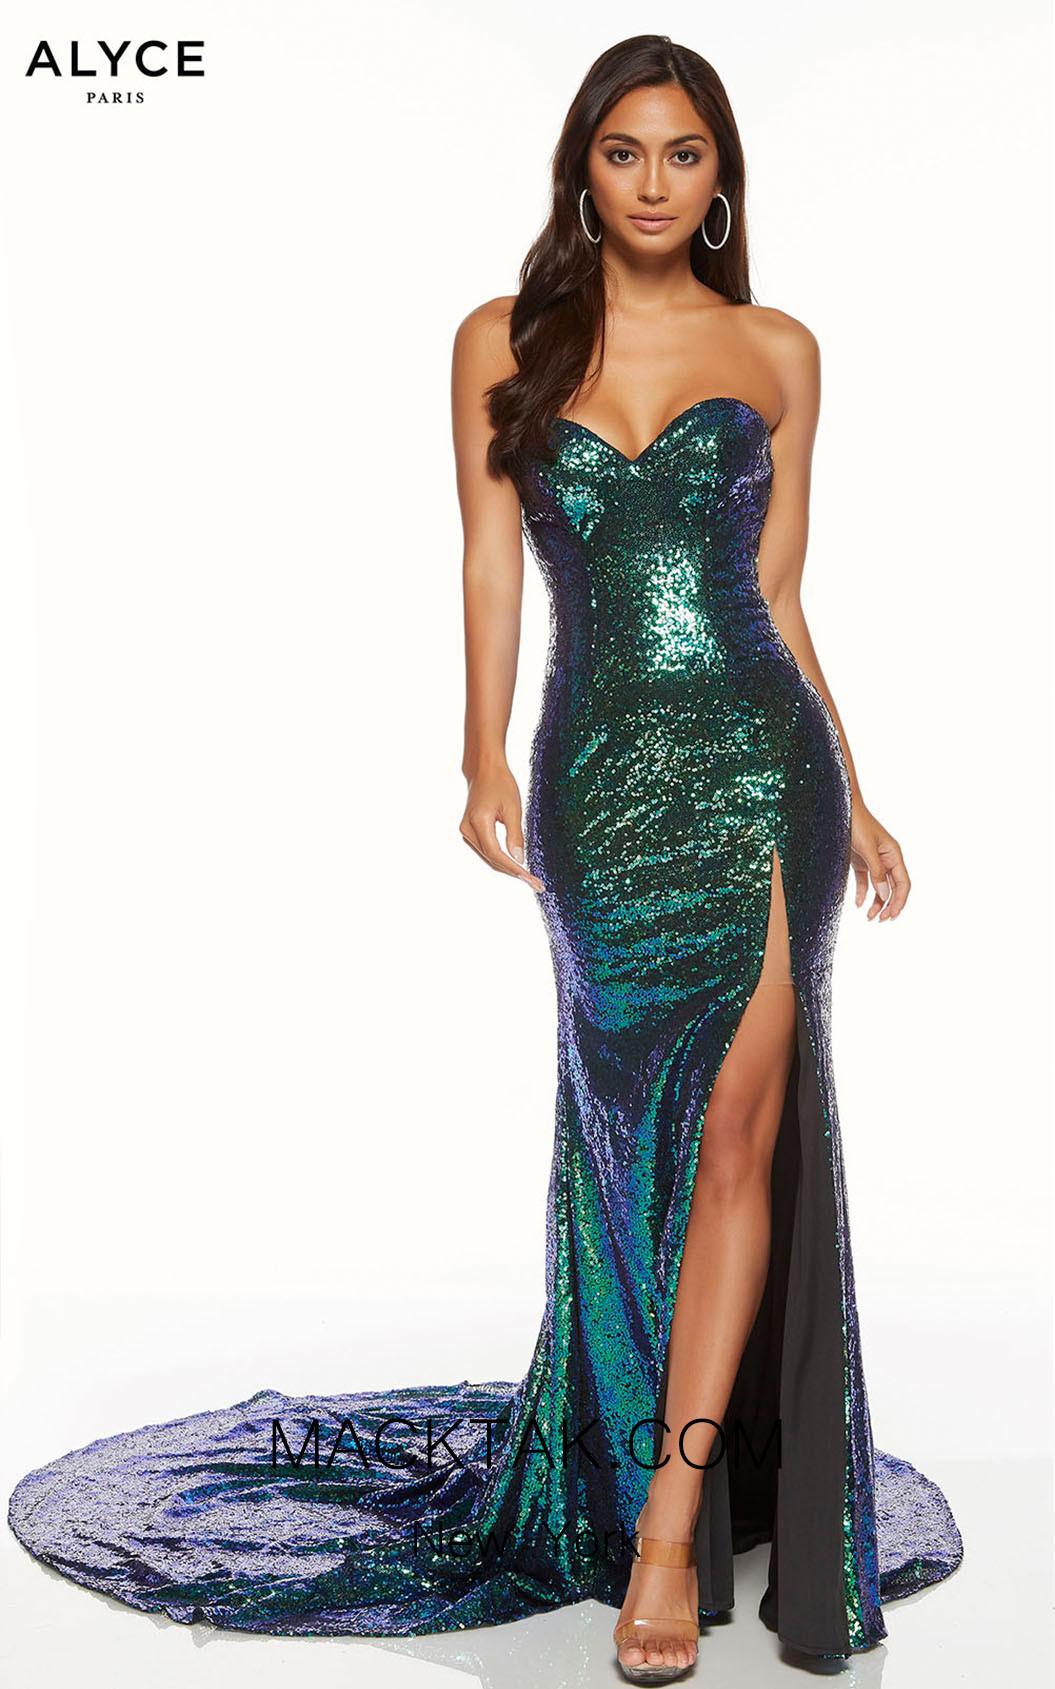 Alyce Paris 60820 Chameleon Front Dress